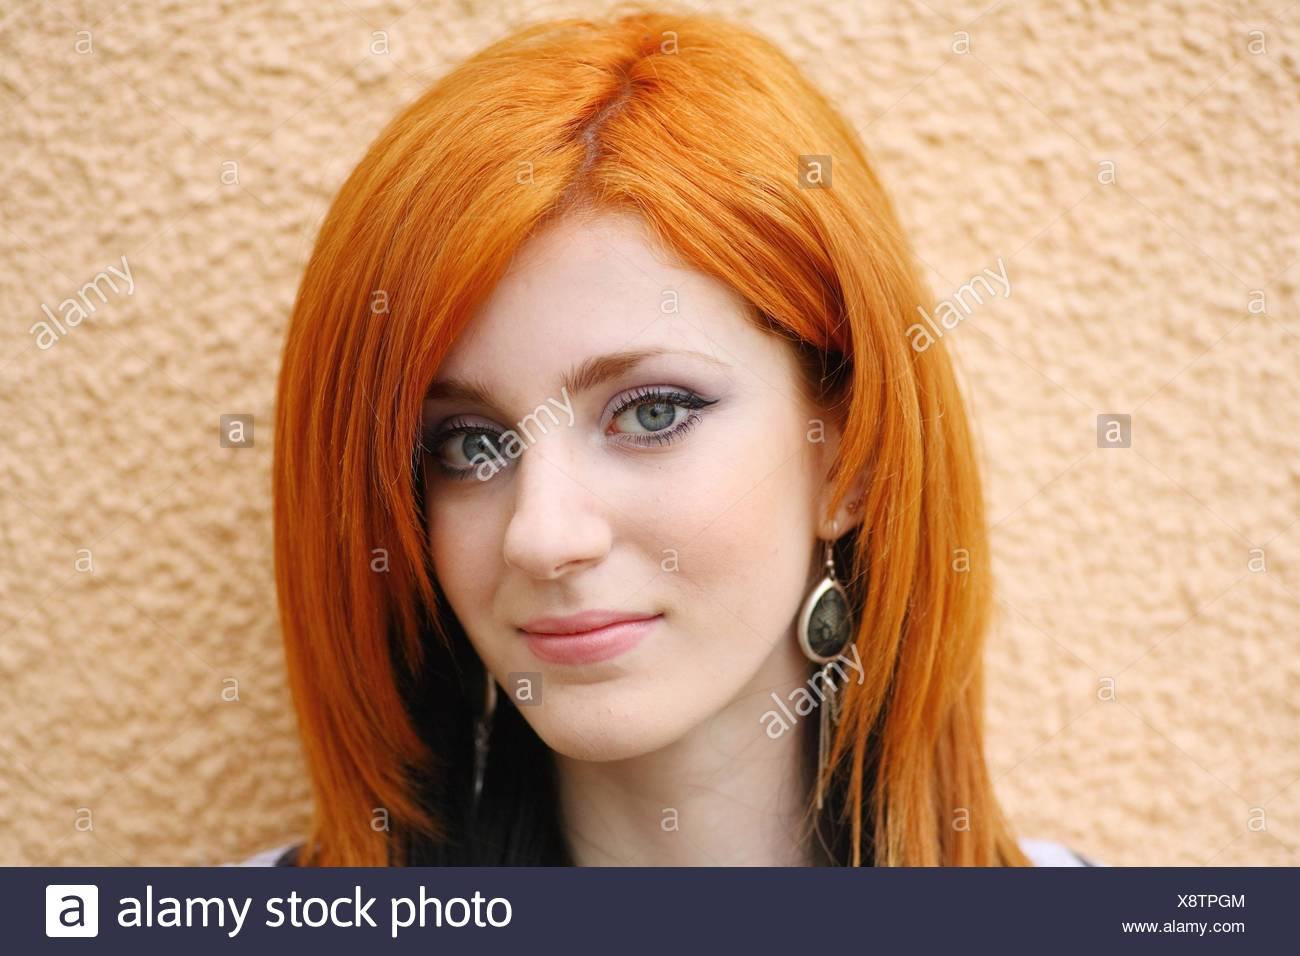 portrait redhead girl face painted stock photos & portrait redhead